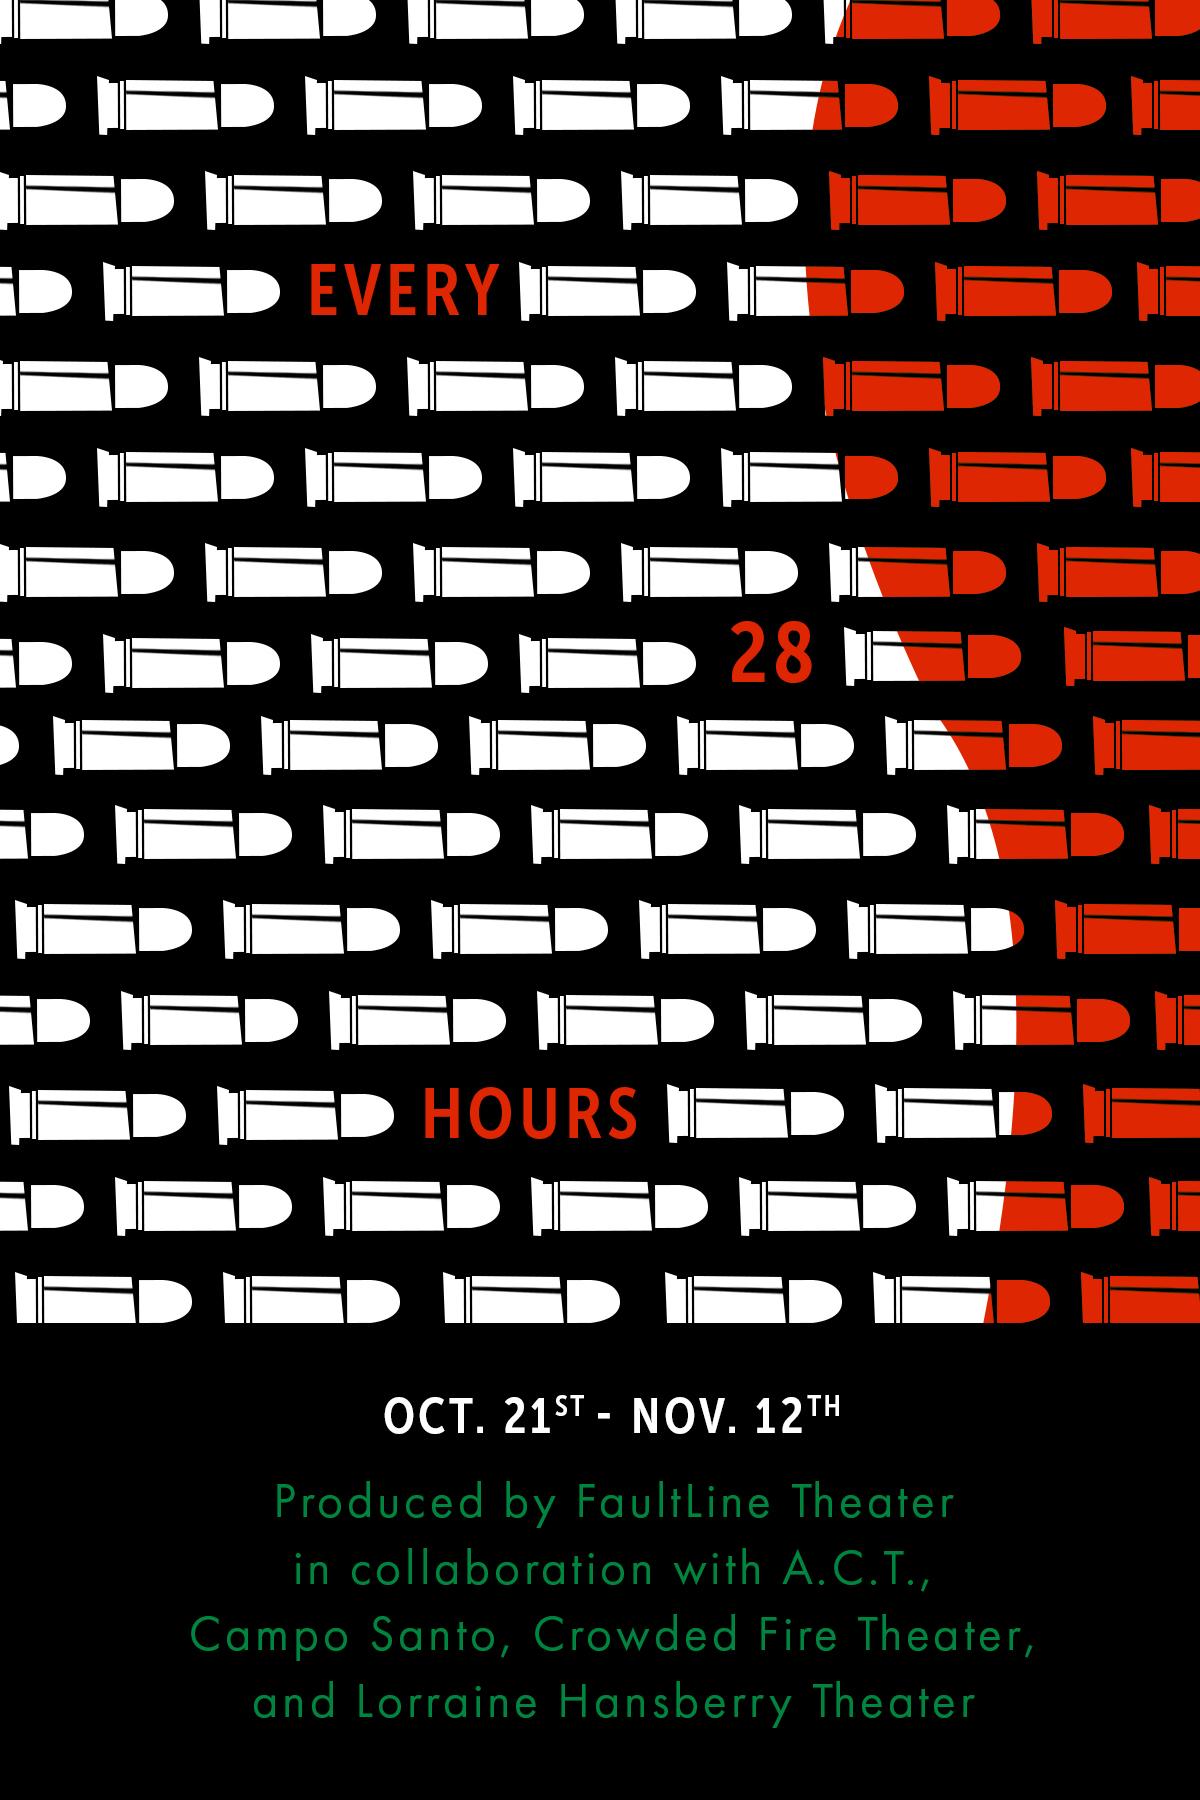 Every 28 Hours